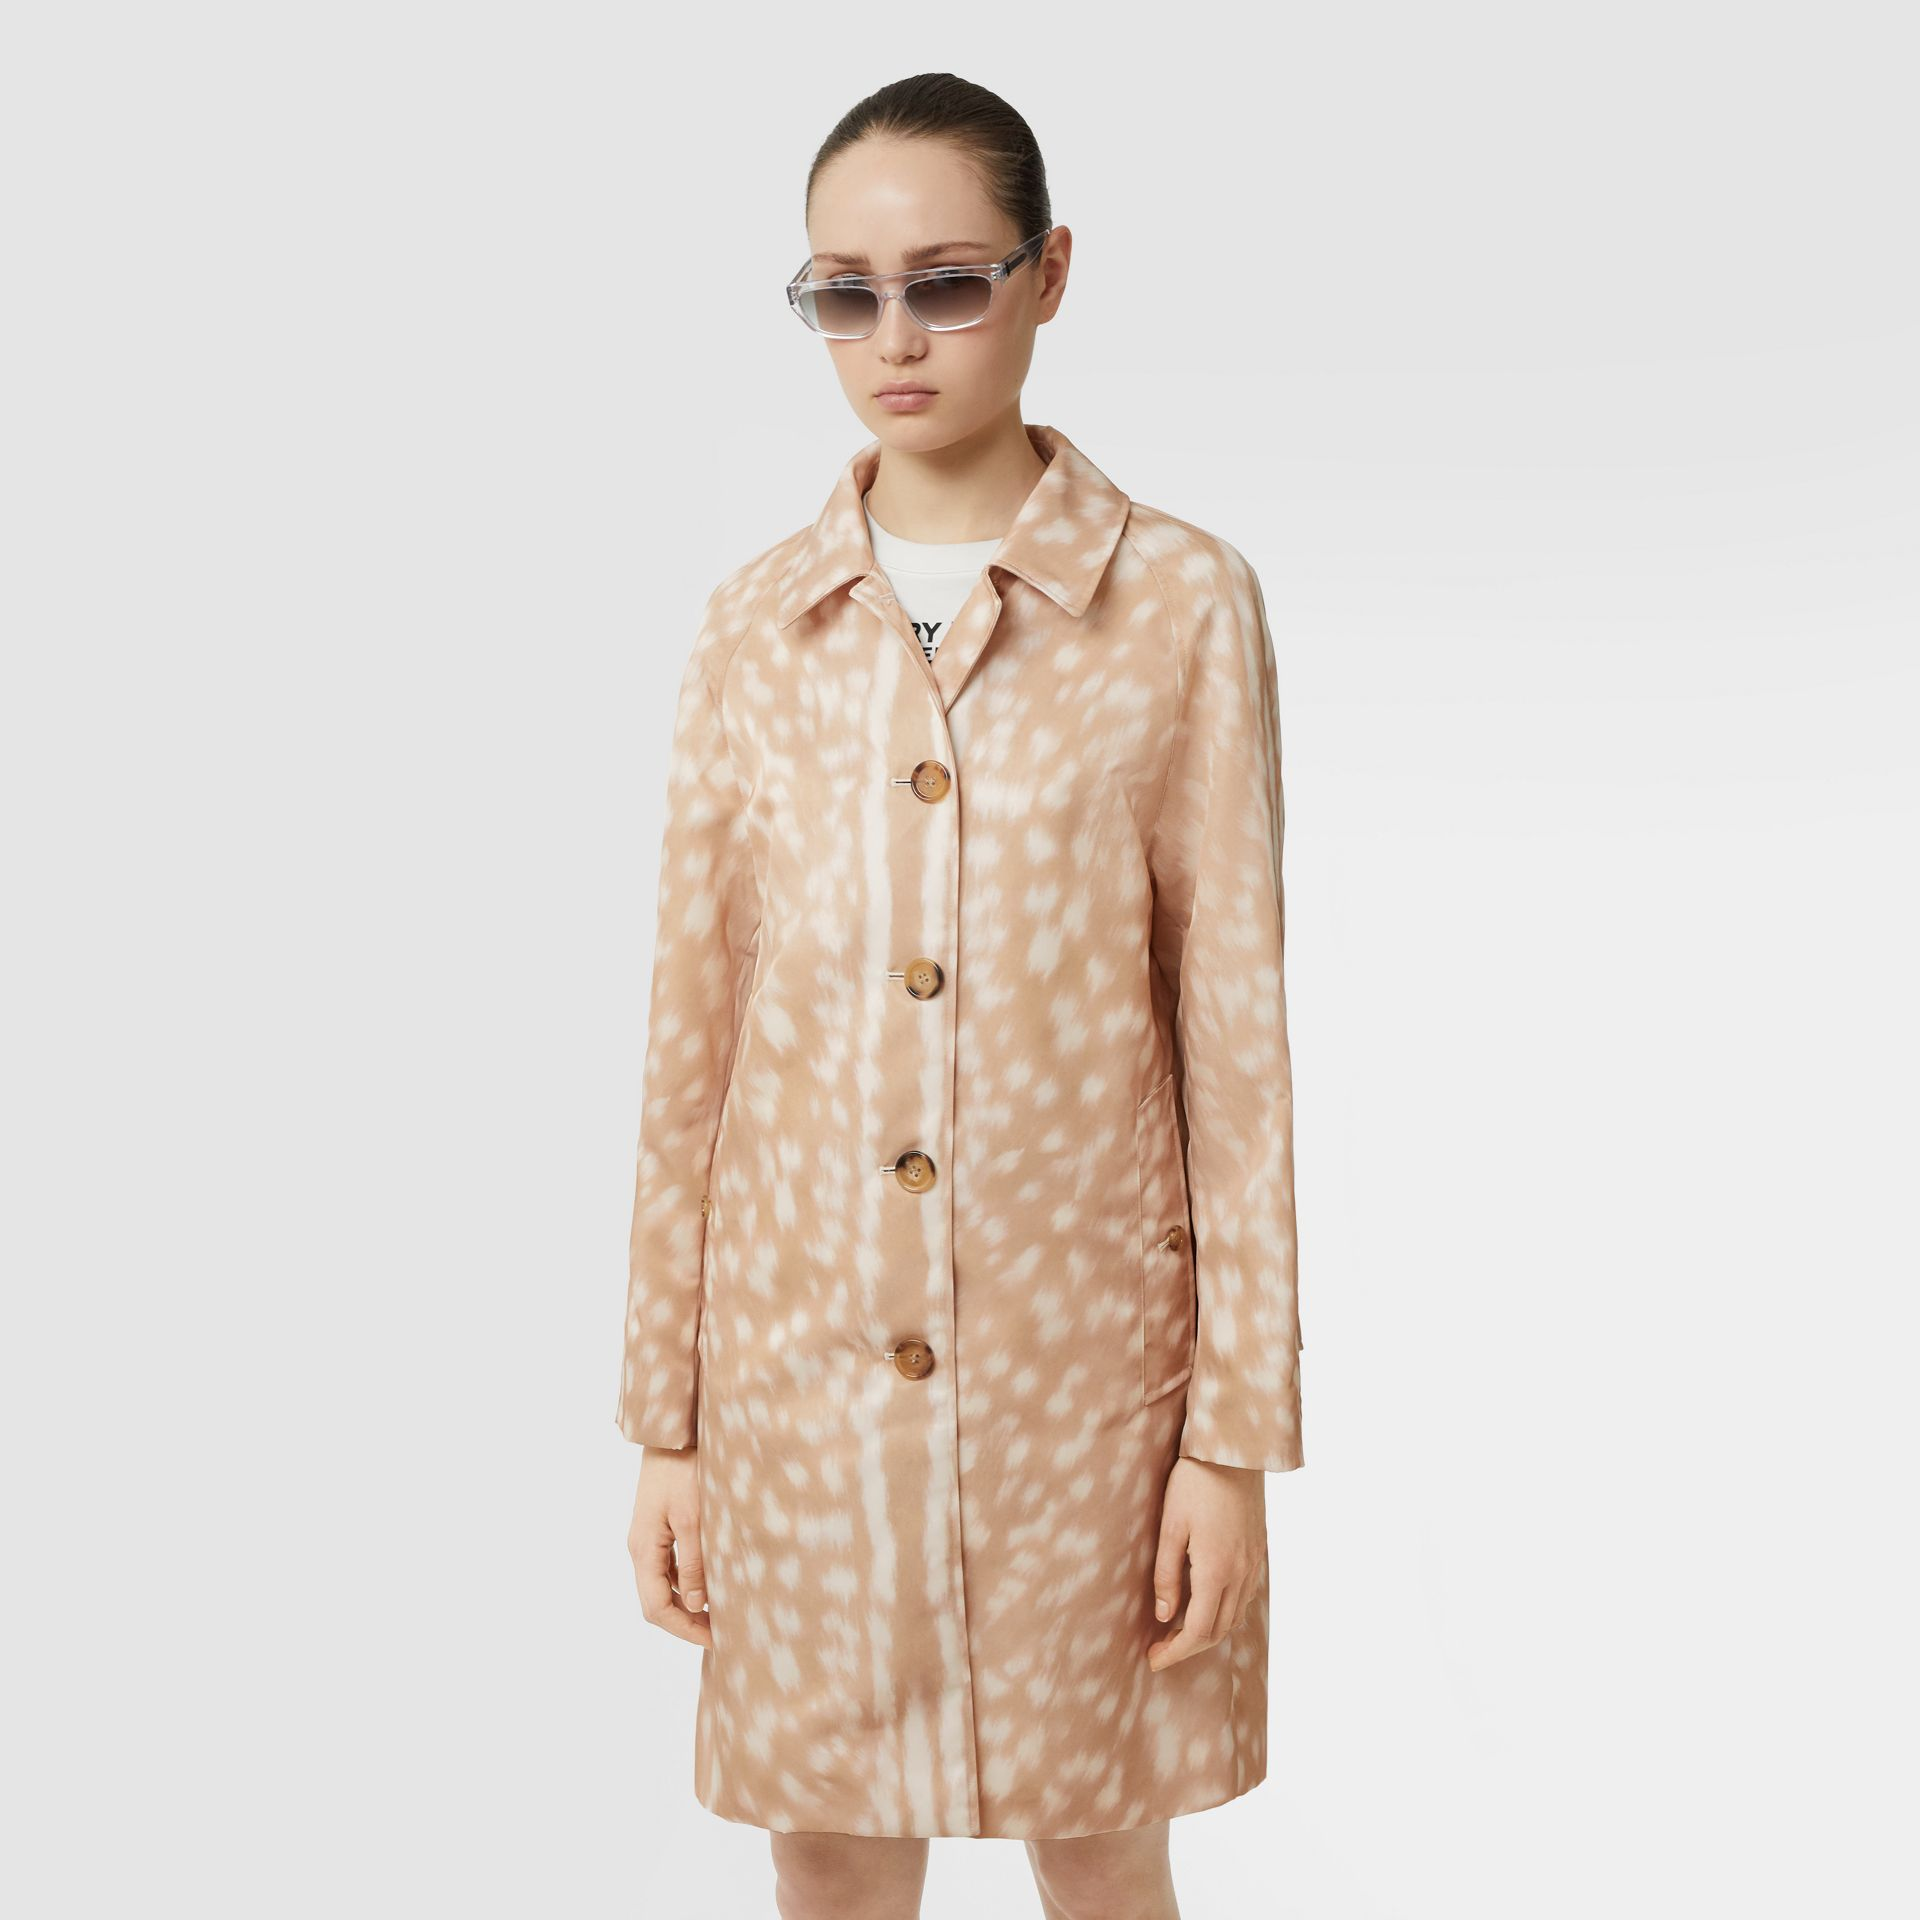 Deer Print Nylon Car Coat in Soft Fawn - Women | Burberry Singapore - gallery image 5